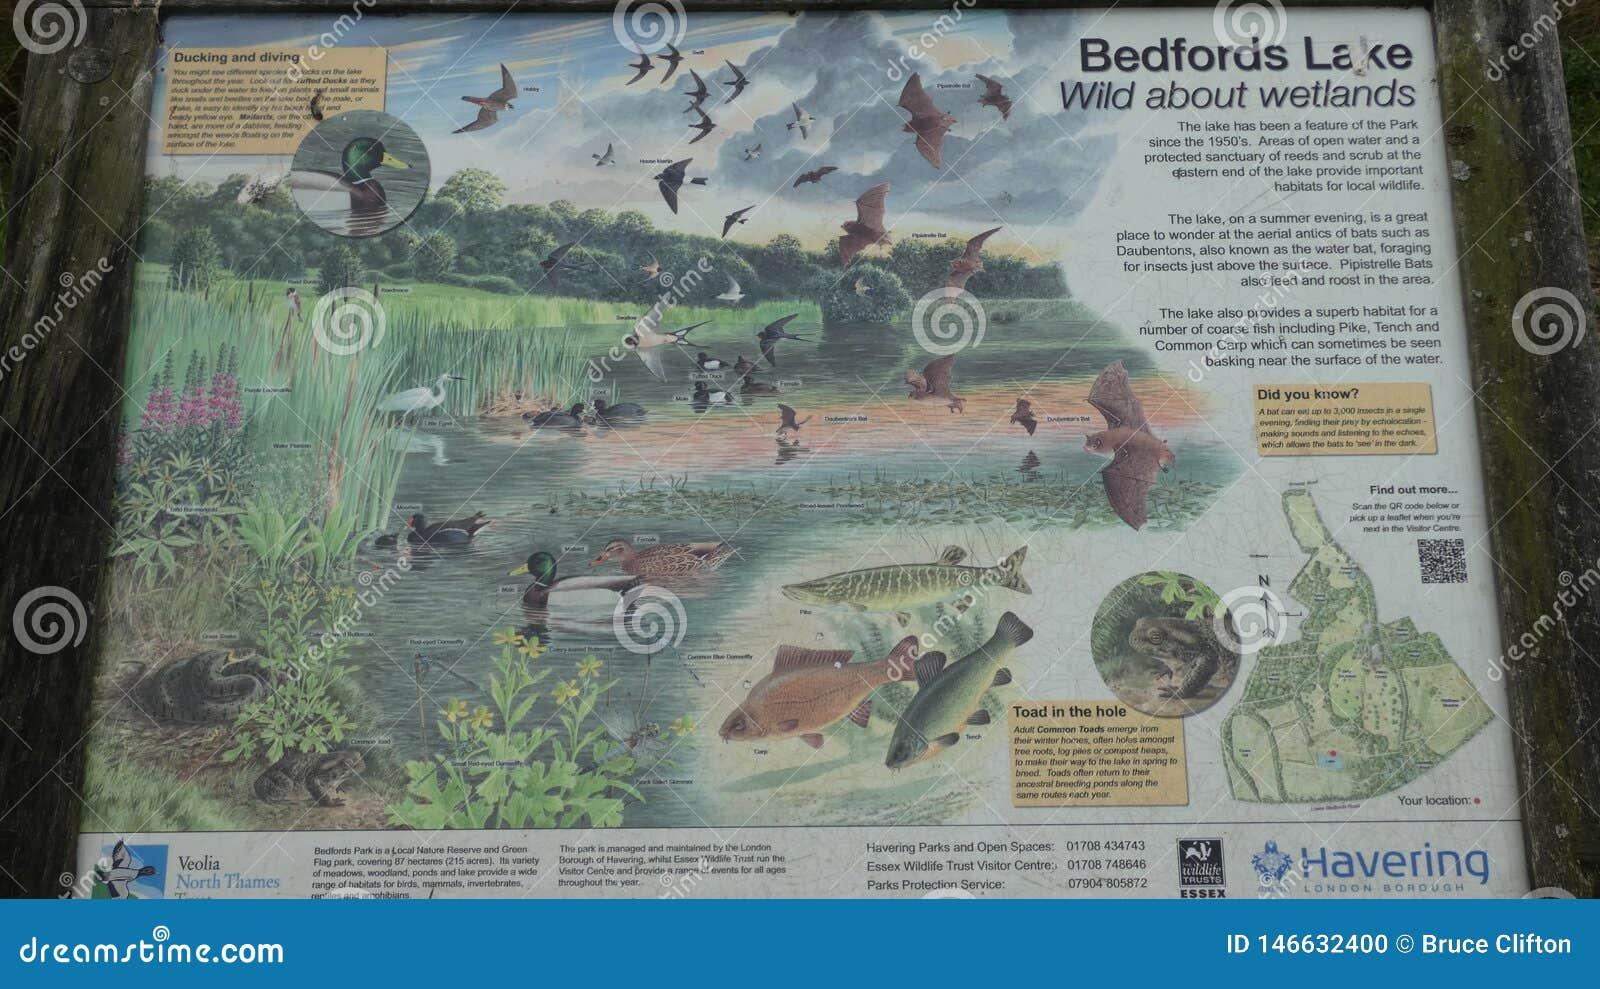 Bedford Park Lake London Borough of Havering